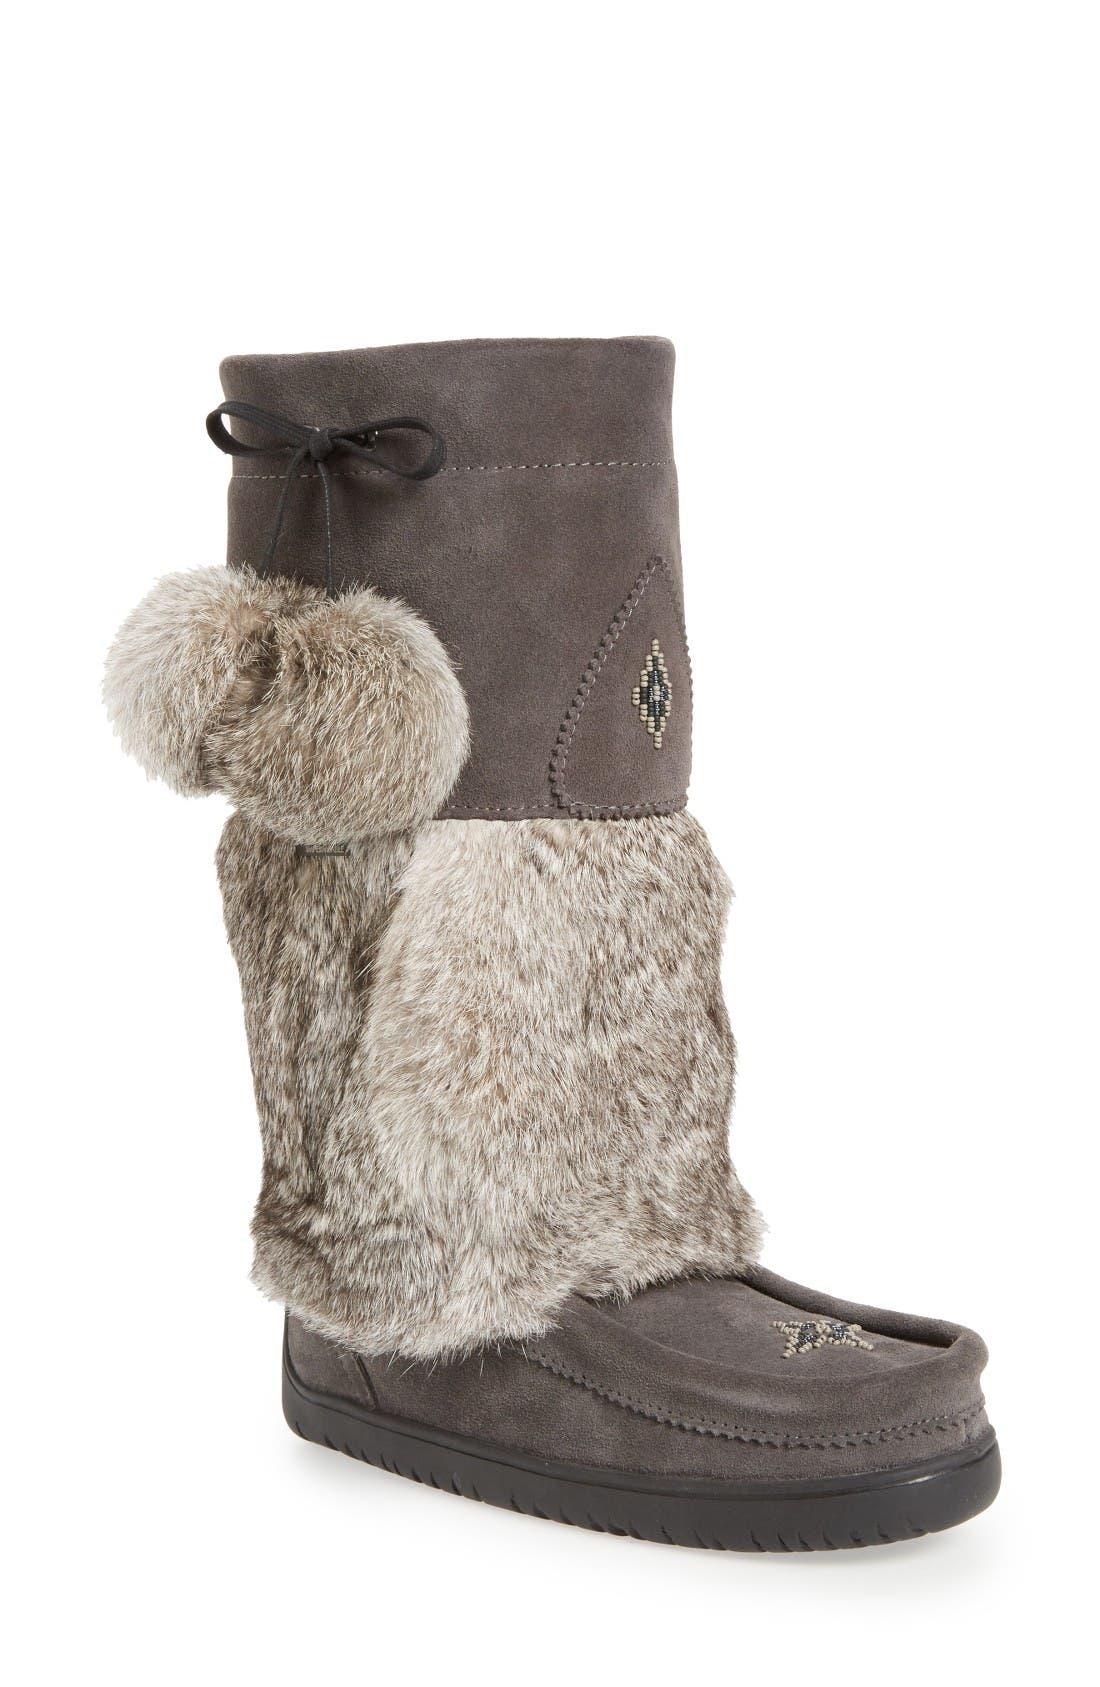 Alternate Image 1 Selected - Manitobah Mukluks Snowy Owl Waterproof Genuine Fur Boot (Women)